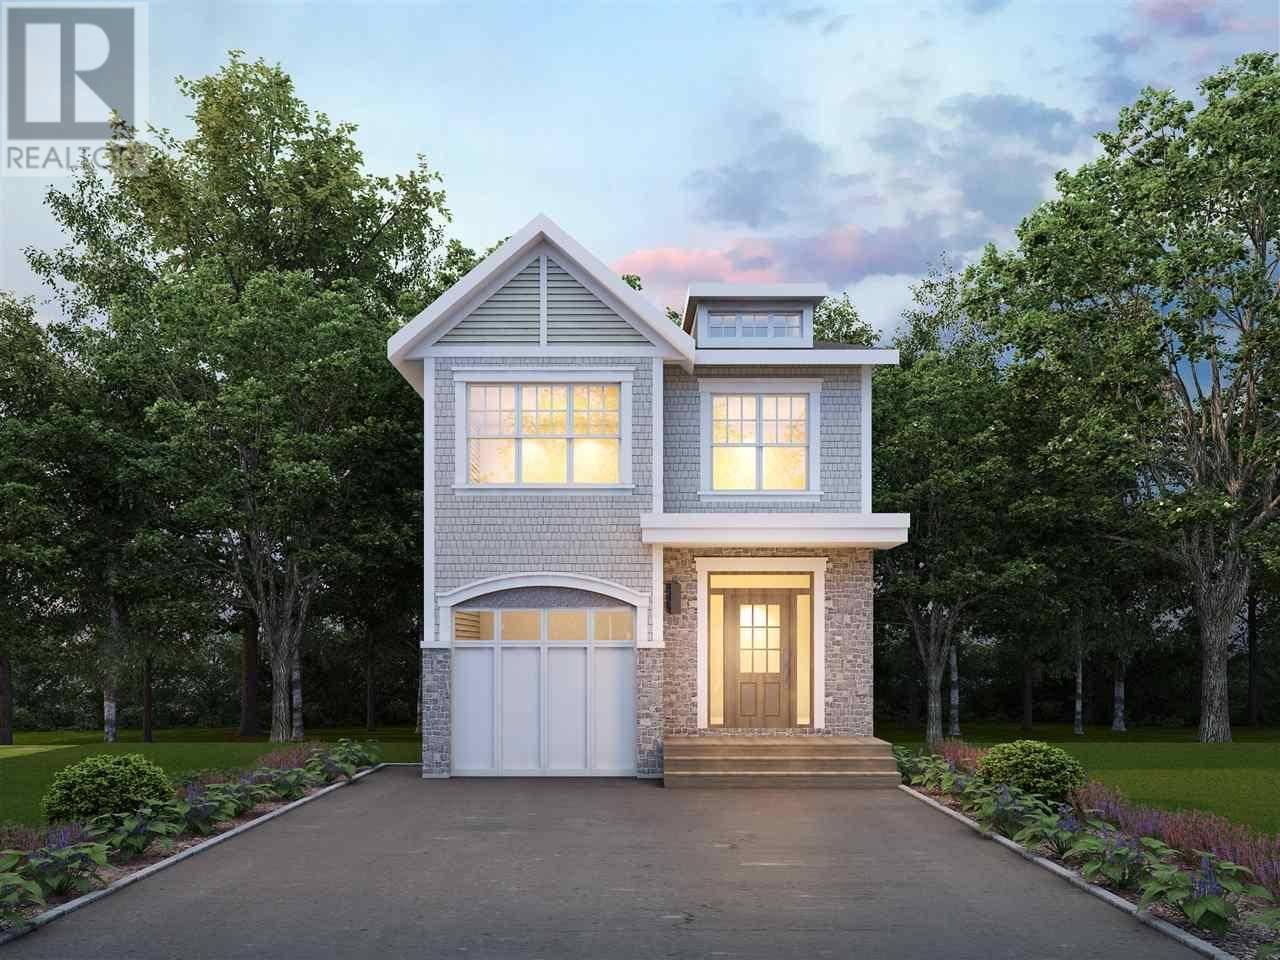 House for sale at 78 Elizabeth Doane Dr Unit Lot Ed38 Bedford Nova Scotia - MLS: 202001216